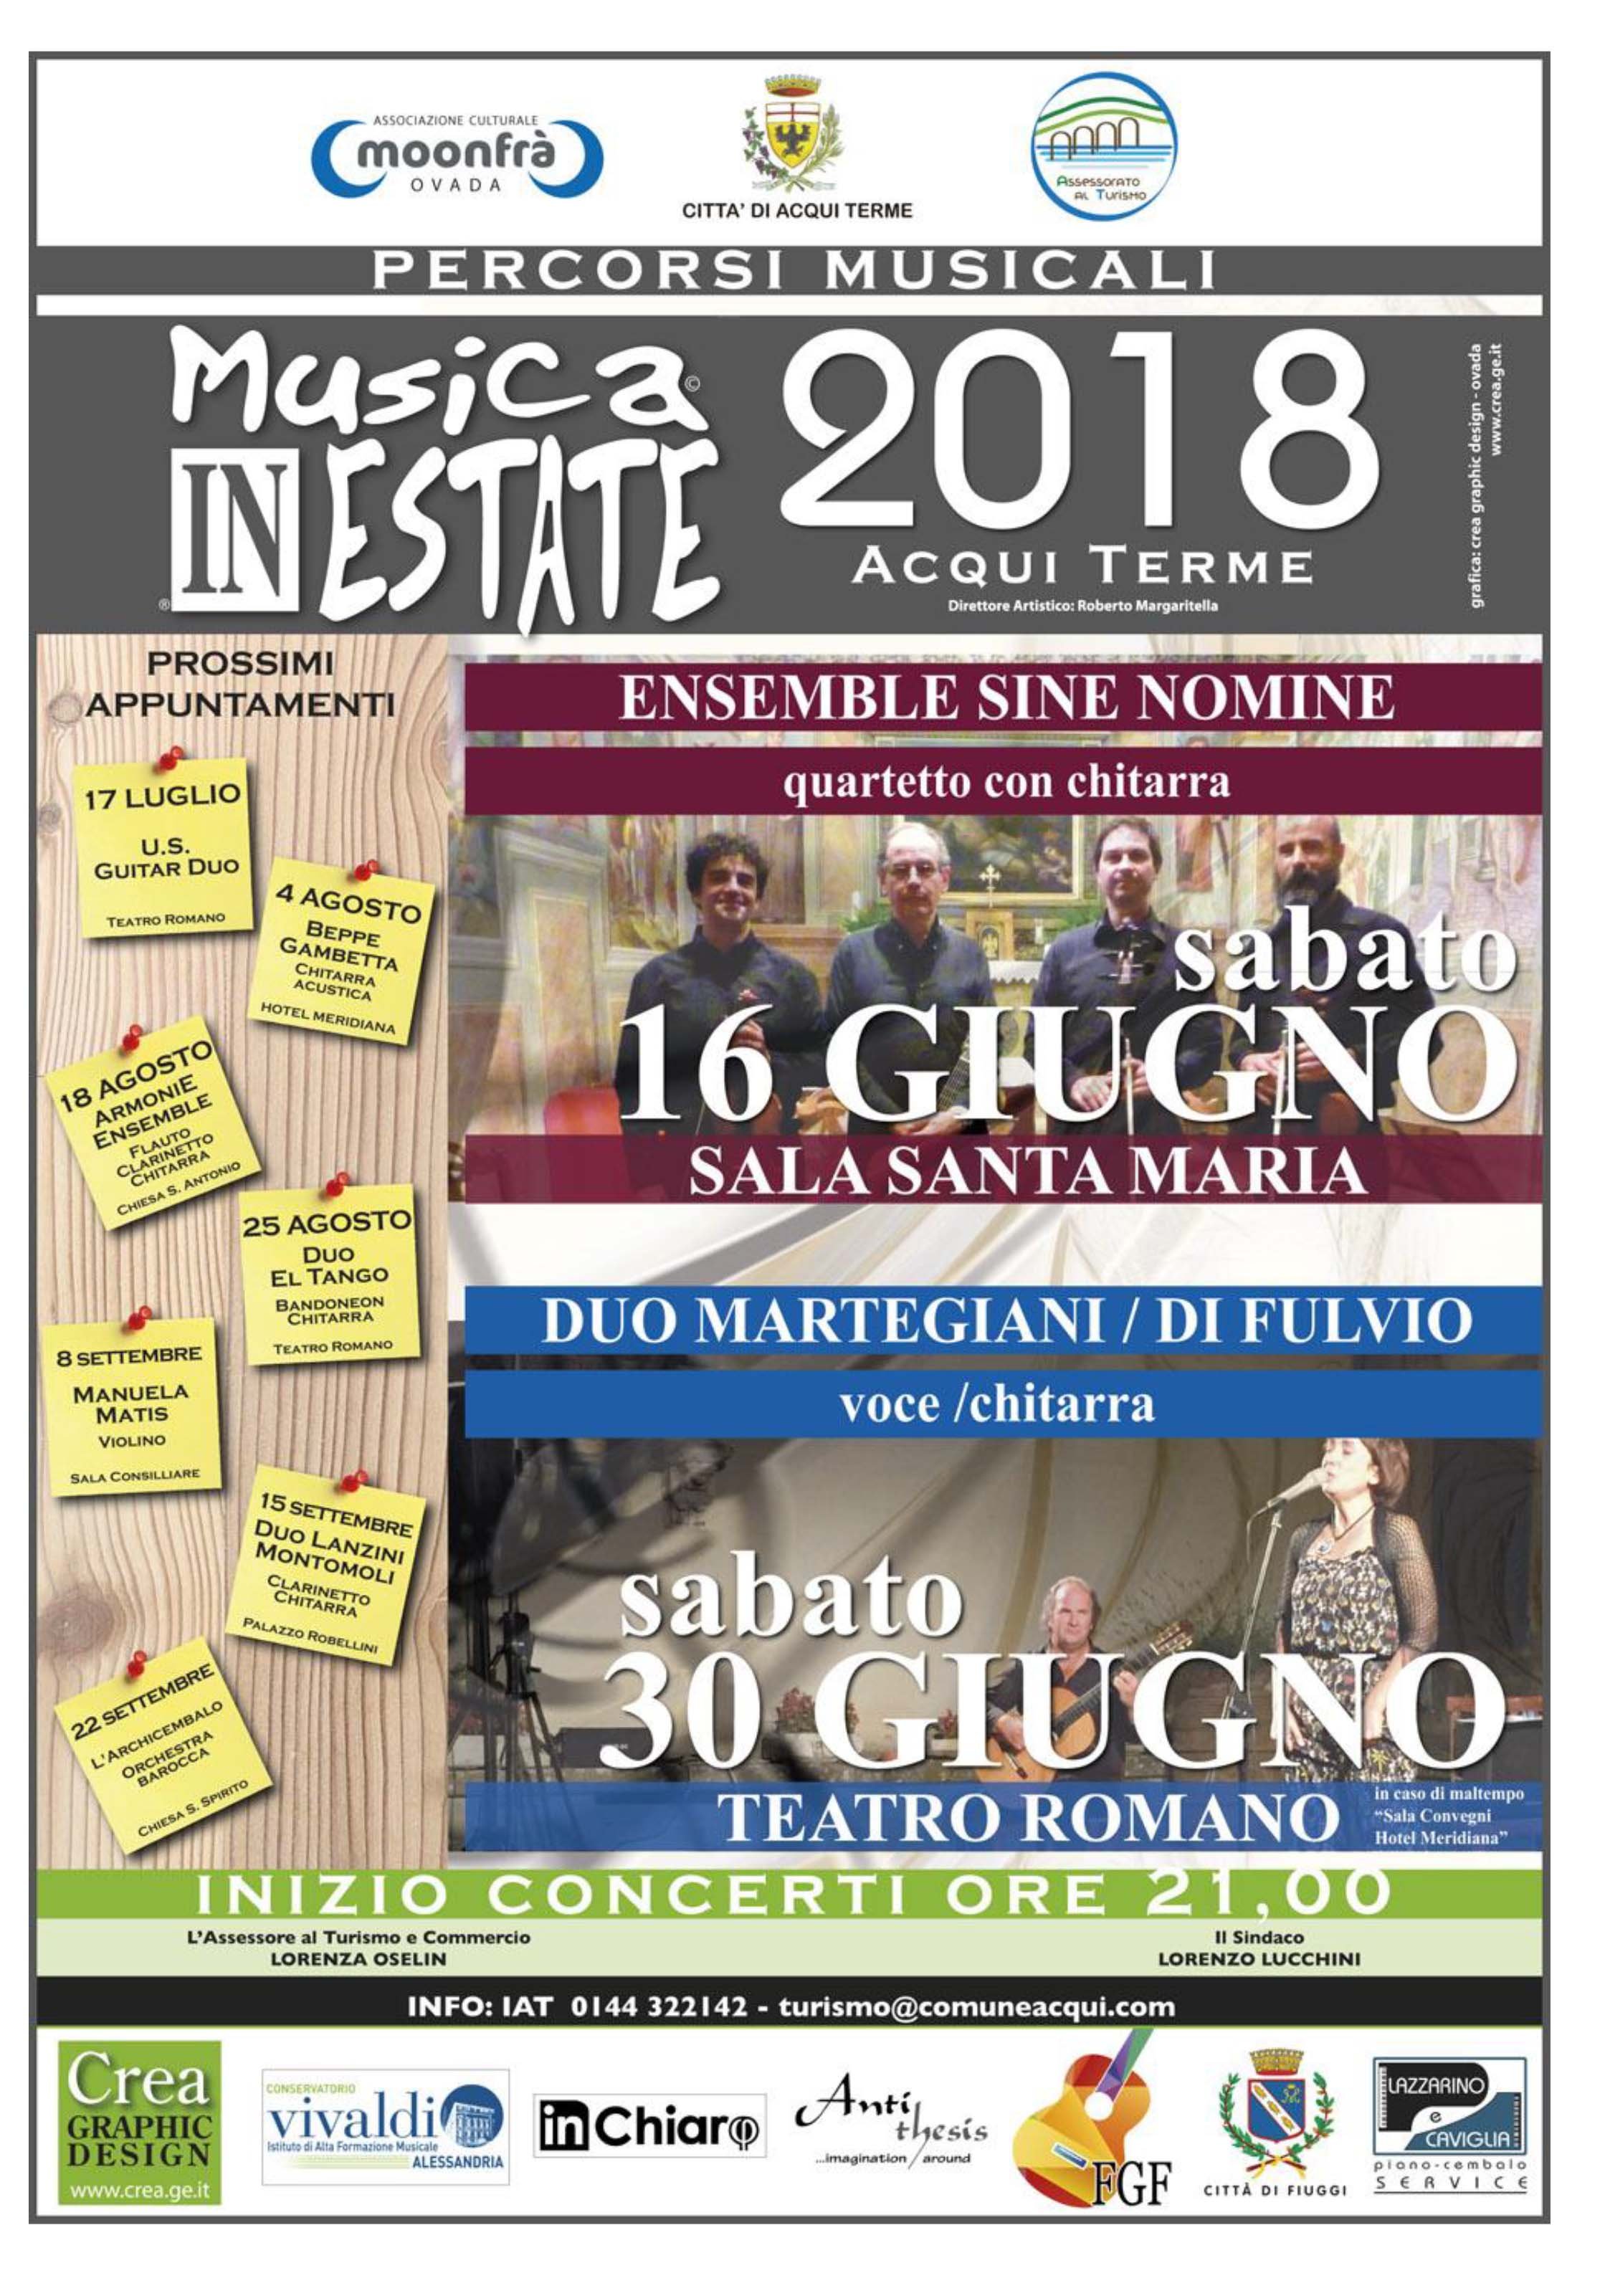 Ad Acqui Terme, Musica in estate